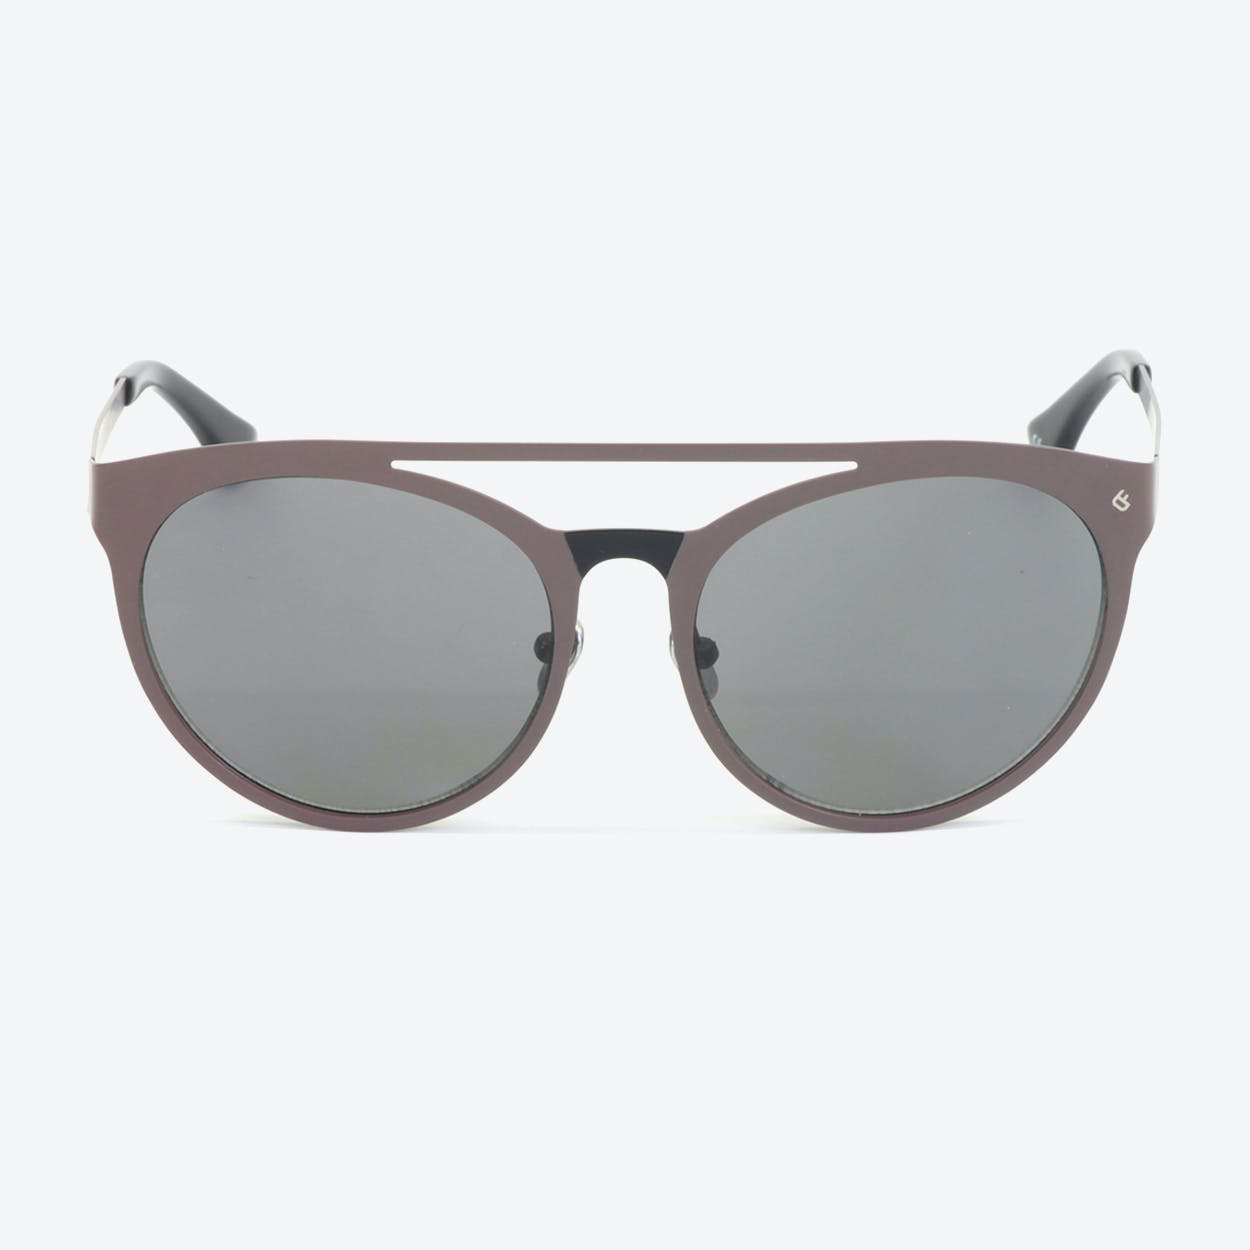 Sunglasses Ethereal C01